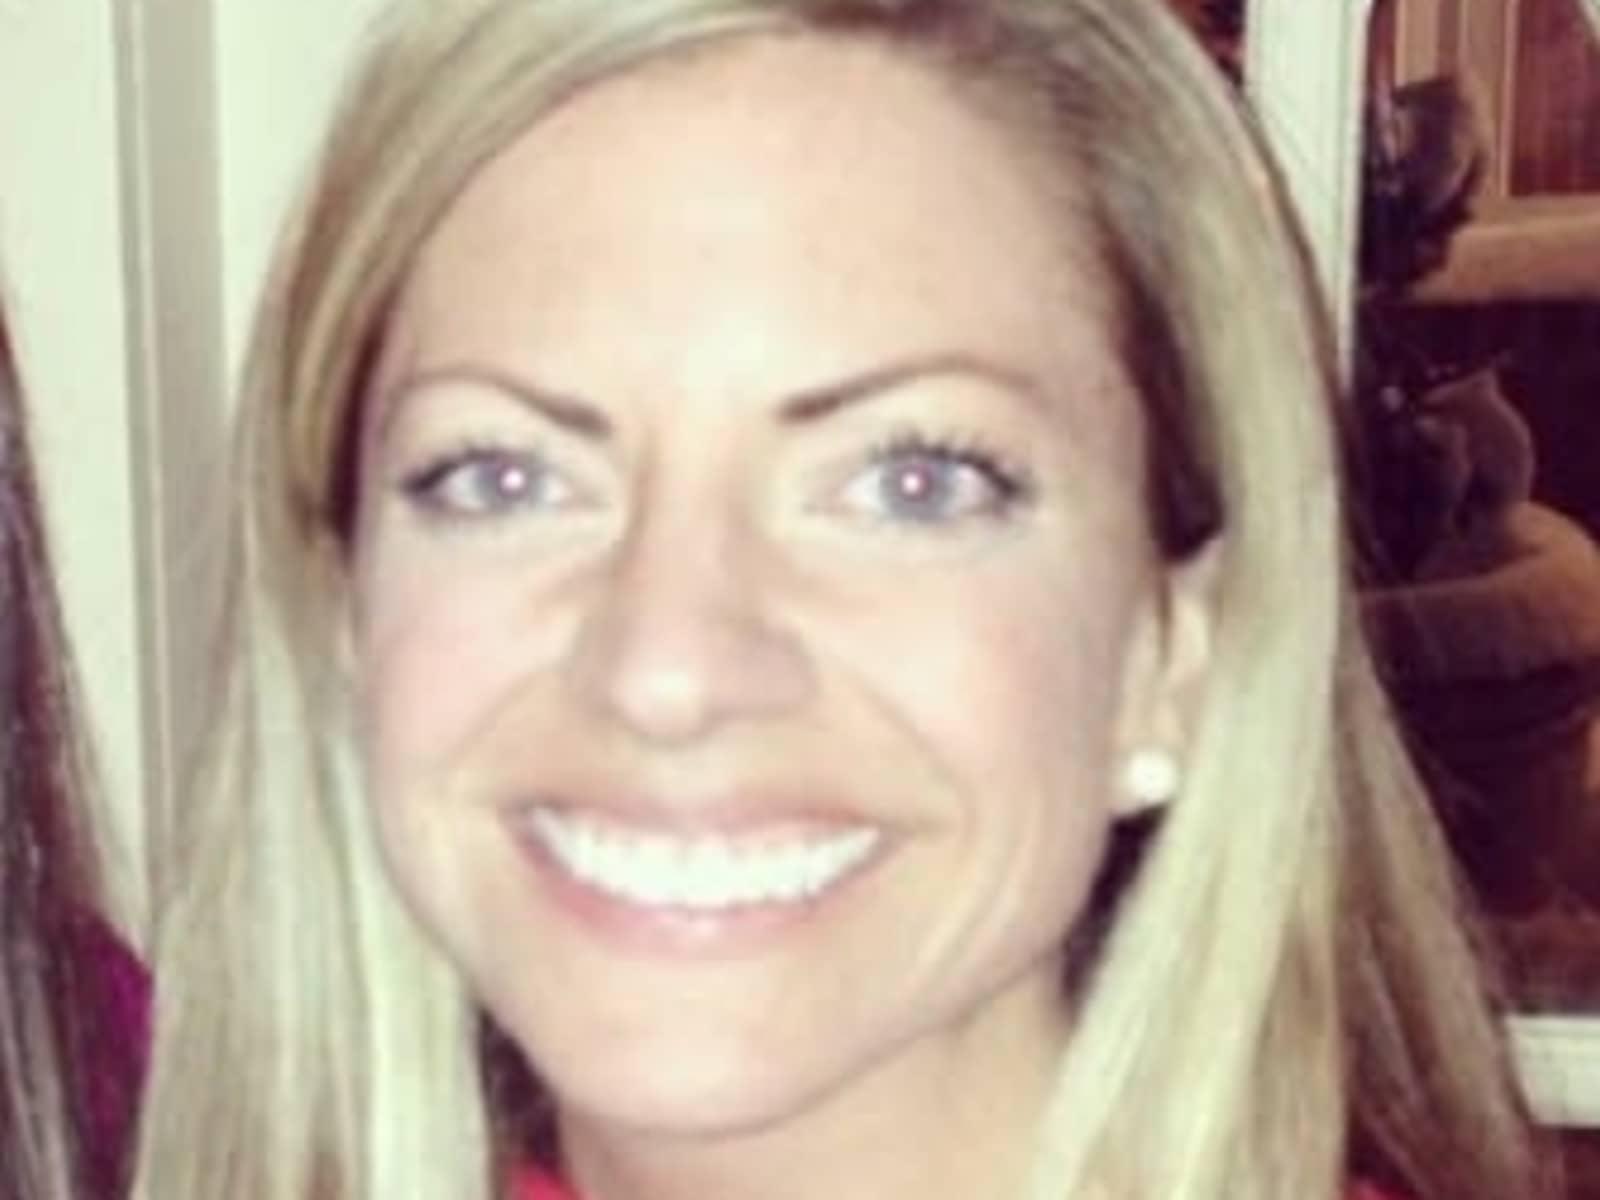 Courtney from Doylestown, Pennsylvania, United States